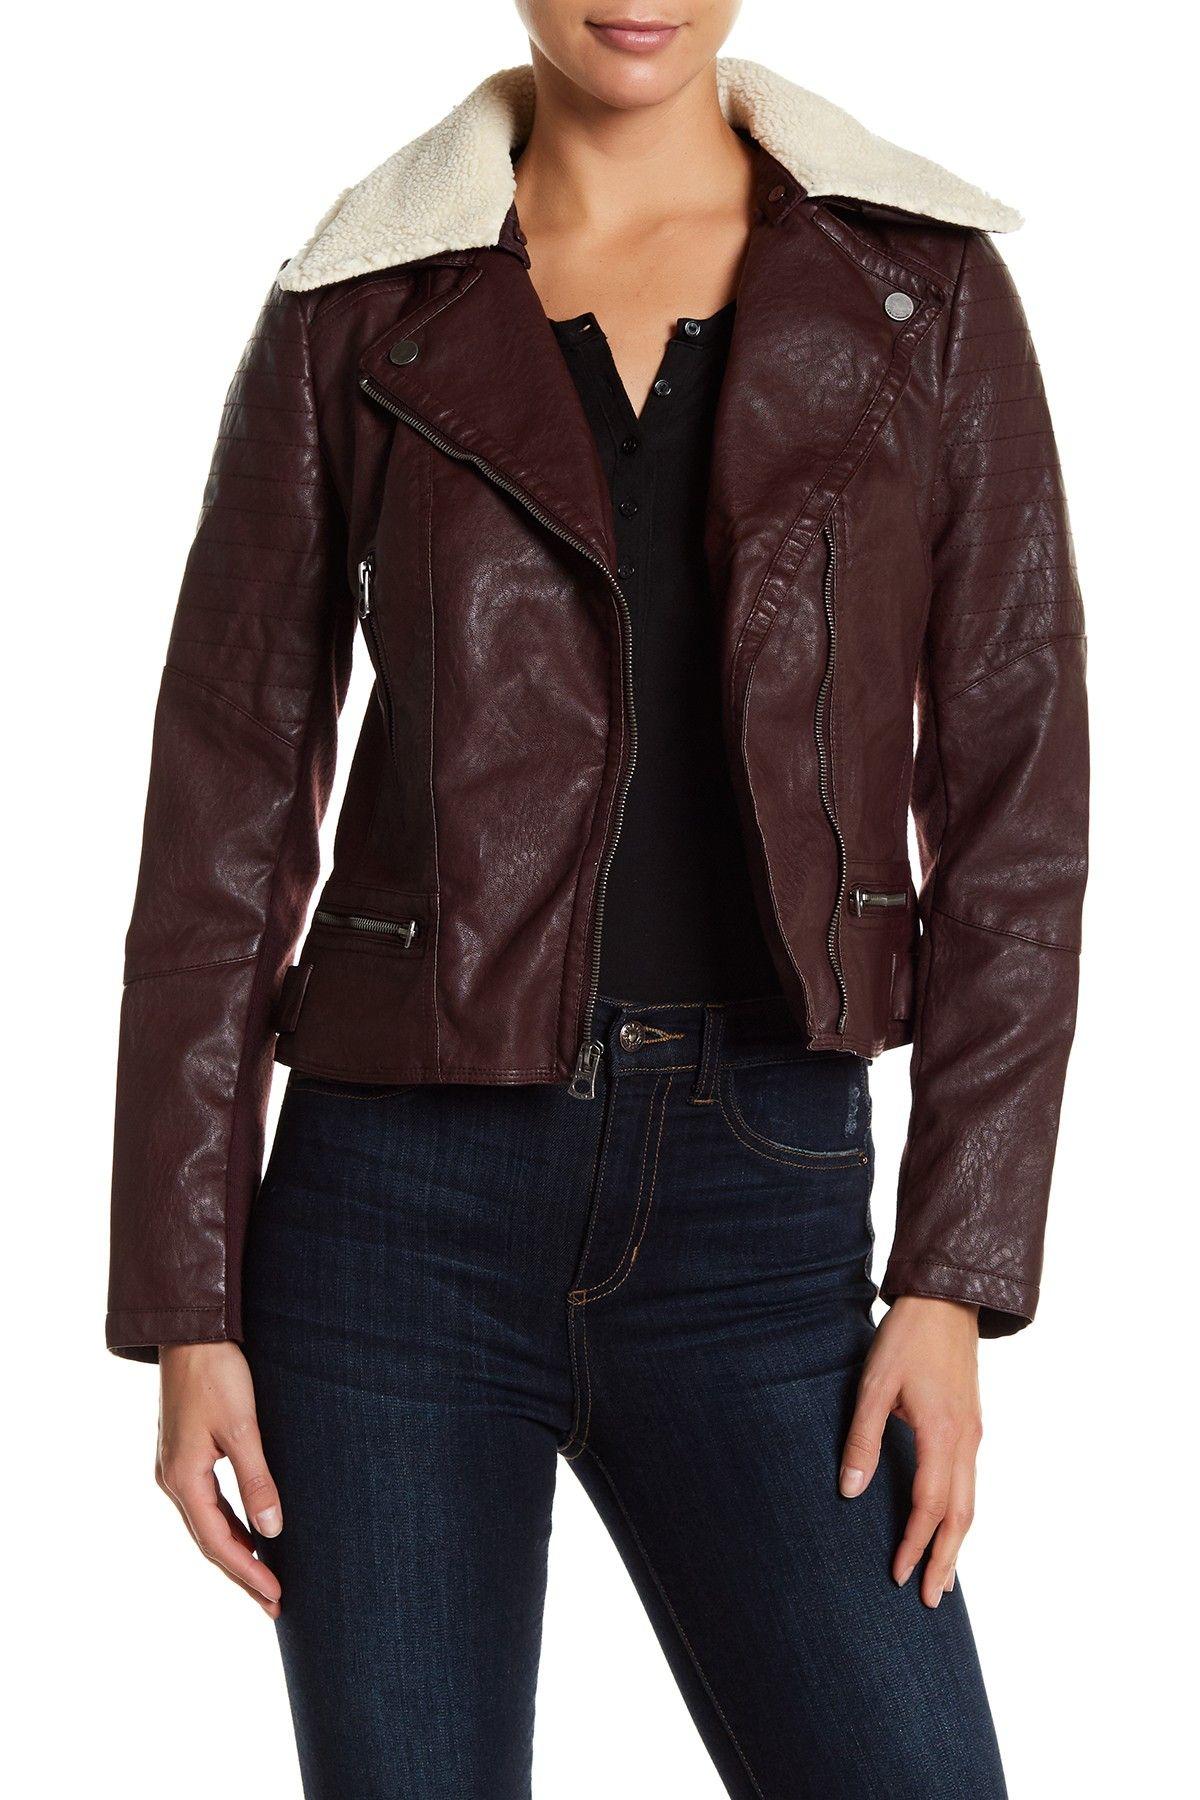 moto leather quilted levi nordstrom s jacket levis faux quilt shop rack product